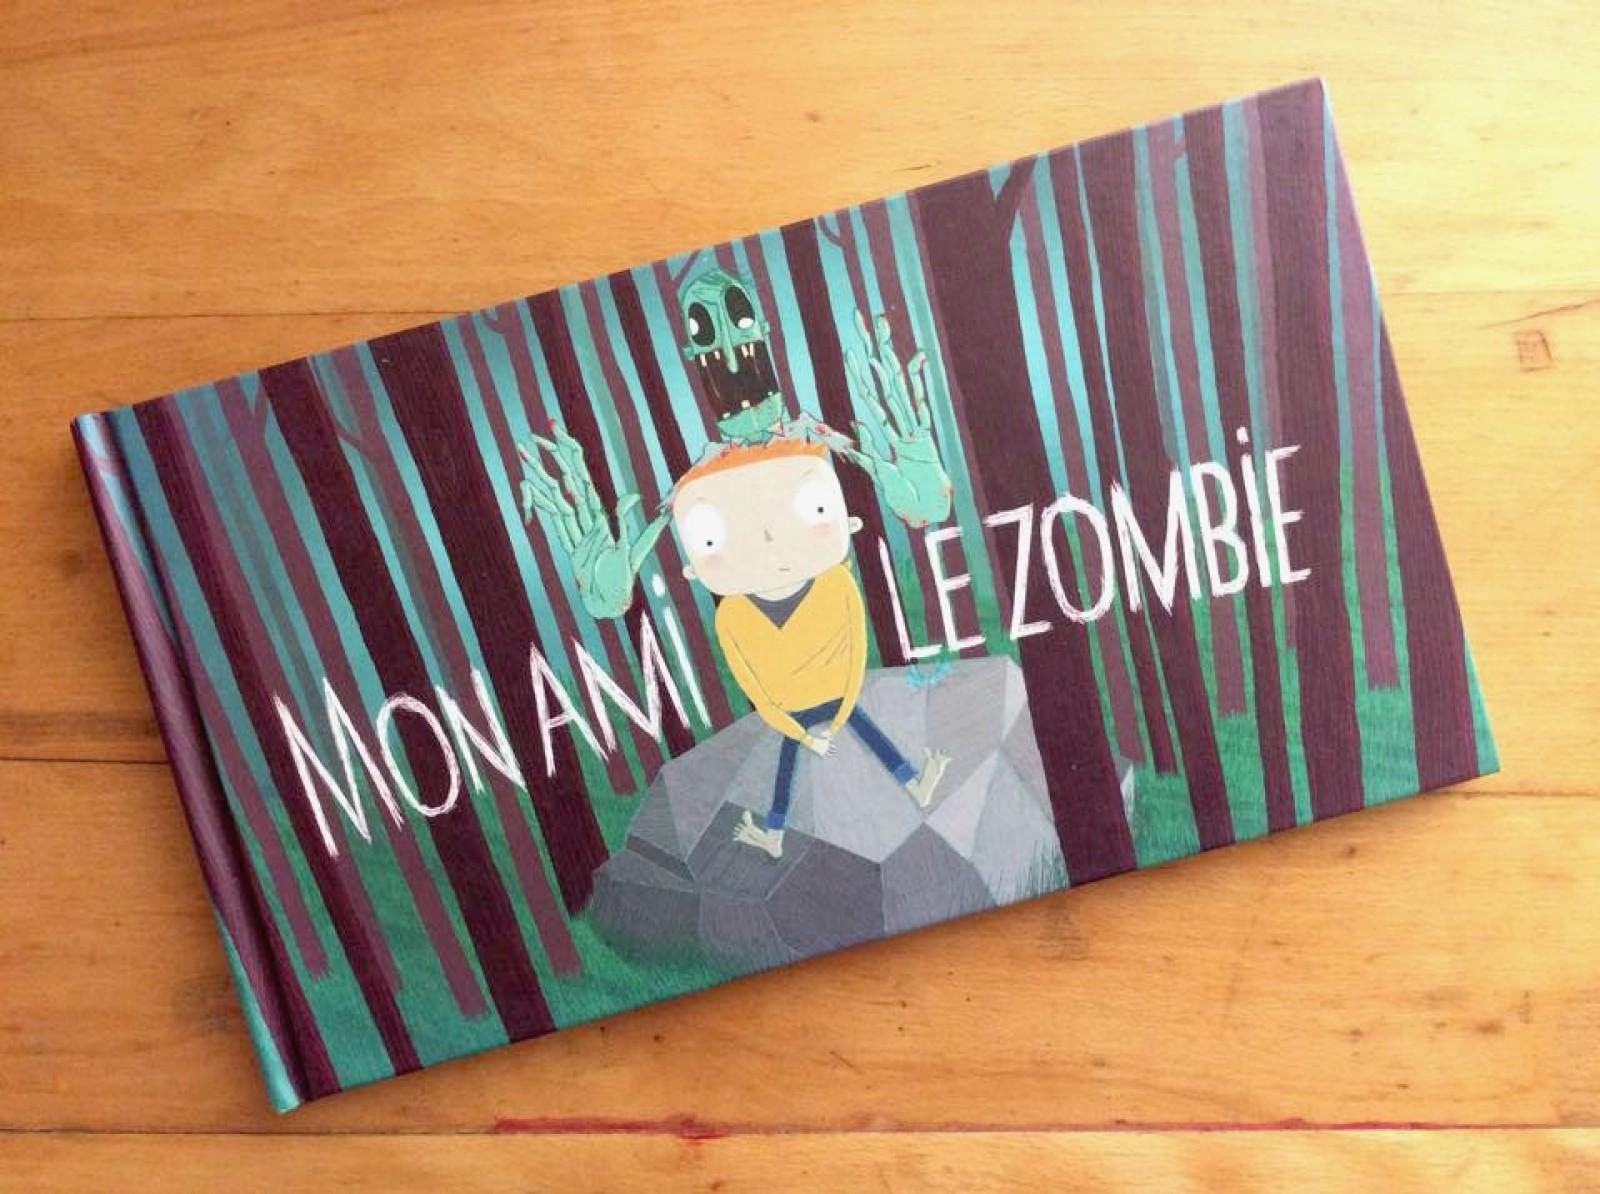 Mon ami le zombie